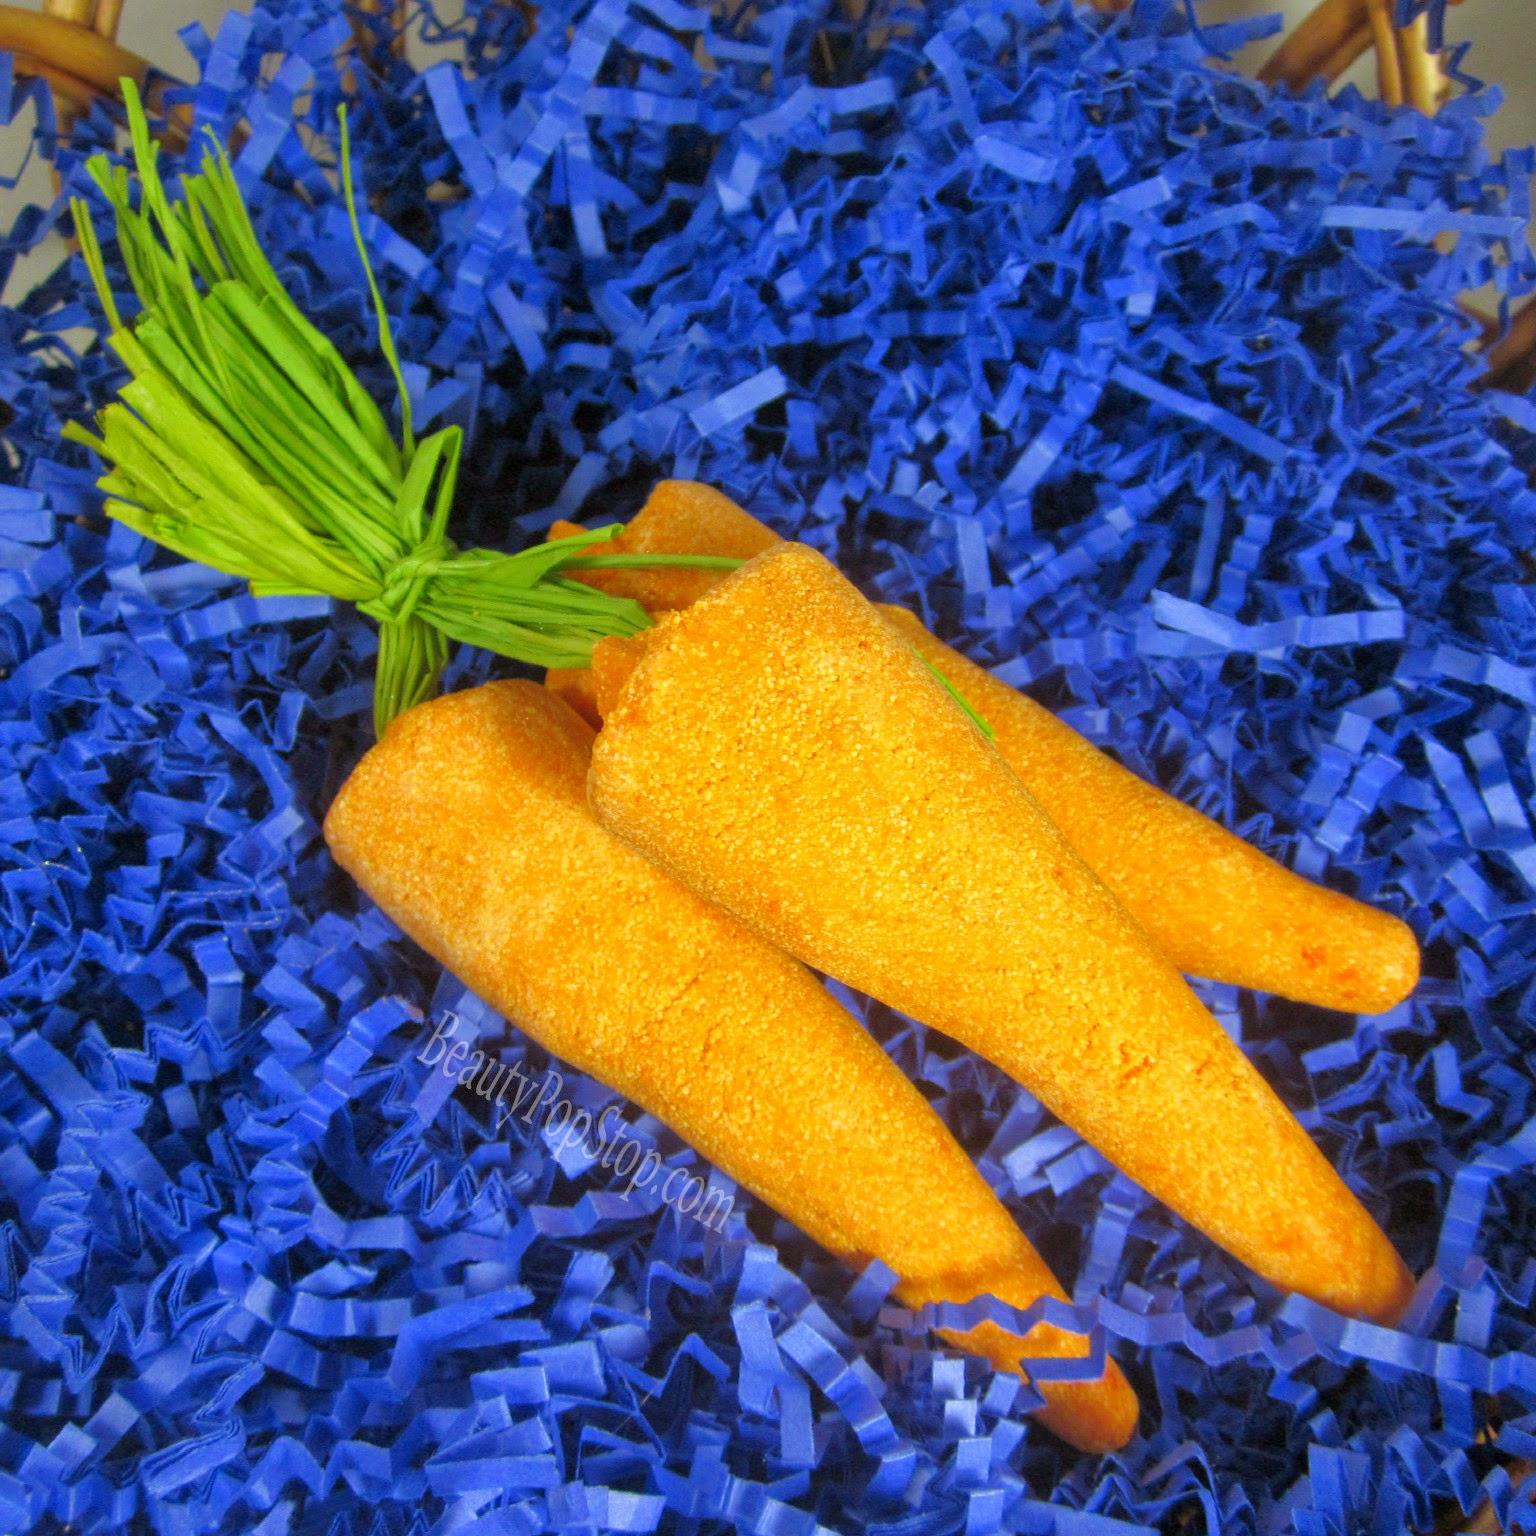 lush bunch of carrots bubble bar review